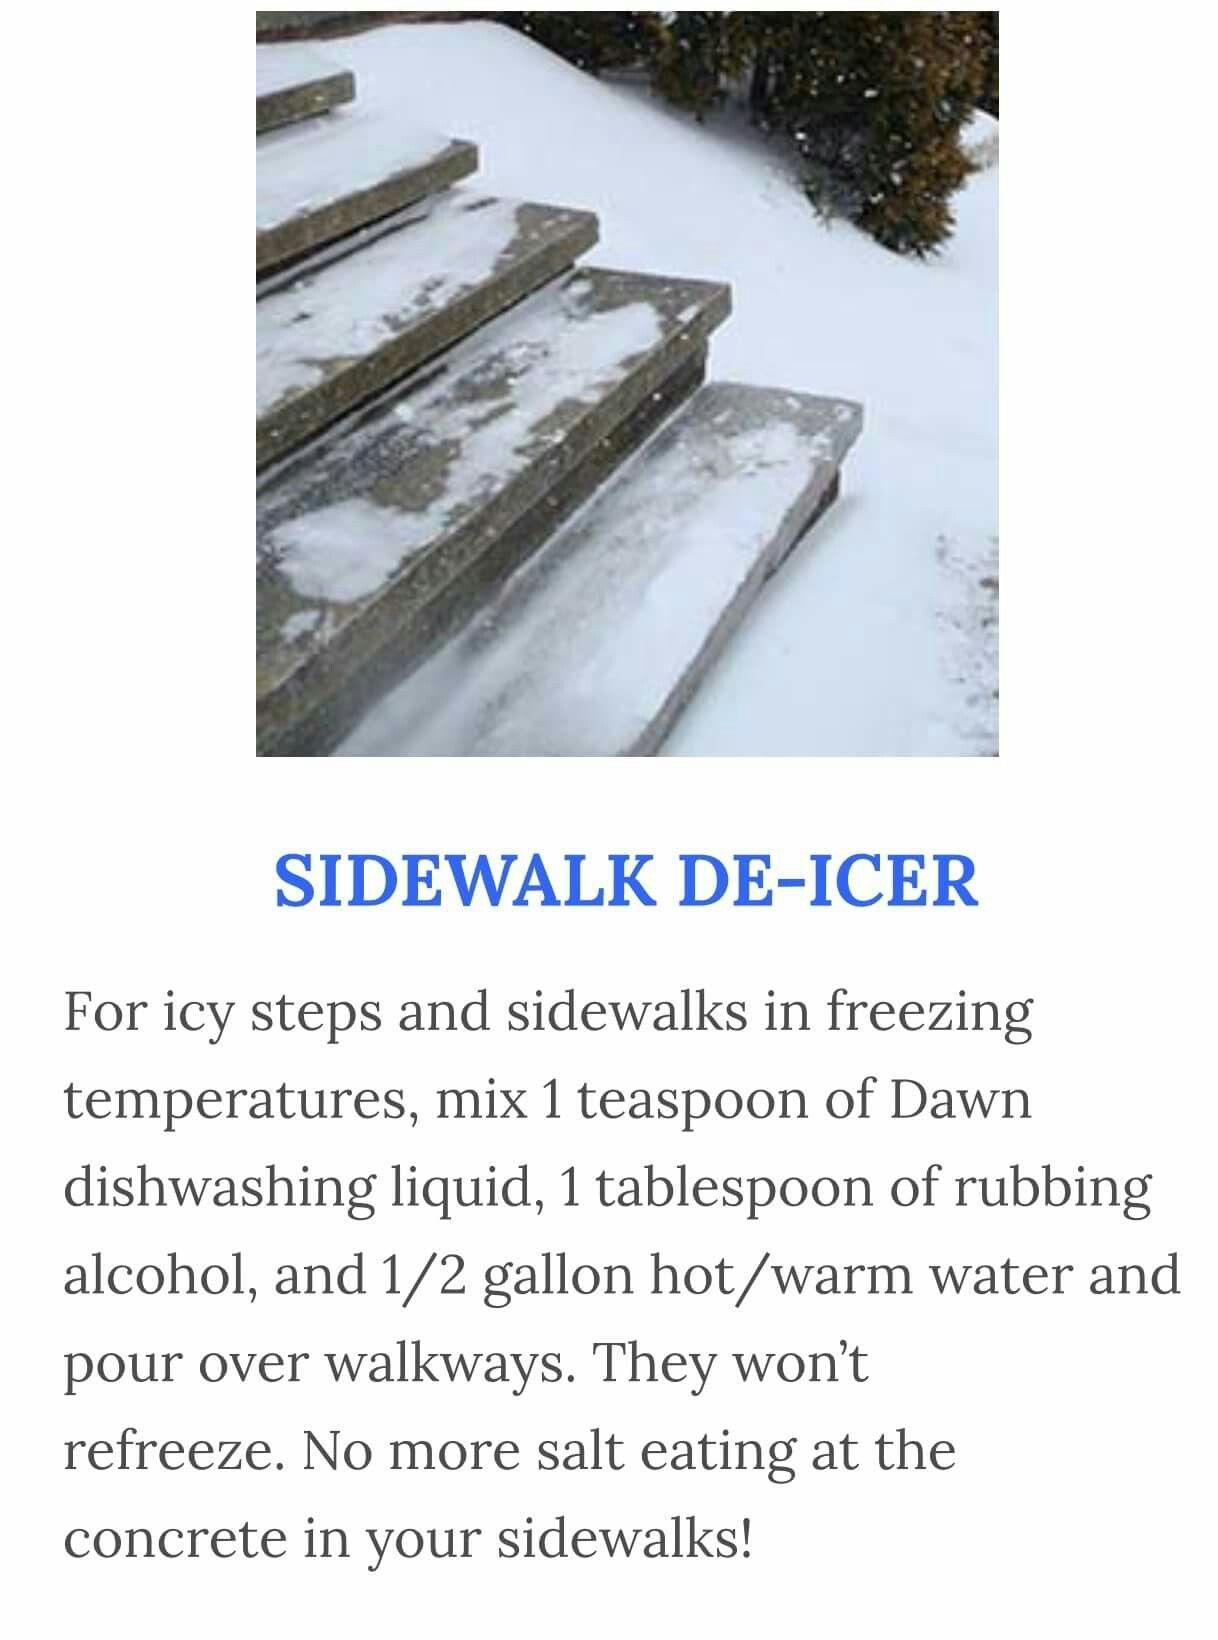 Sidewalk de icer for icy steps sidewalks in freezing sidewalk de icer for icy steps sidewalks in freezing temperatures mix 1 teaspoon solutioingenieria Gallery